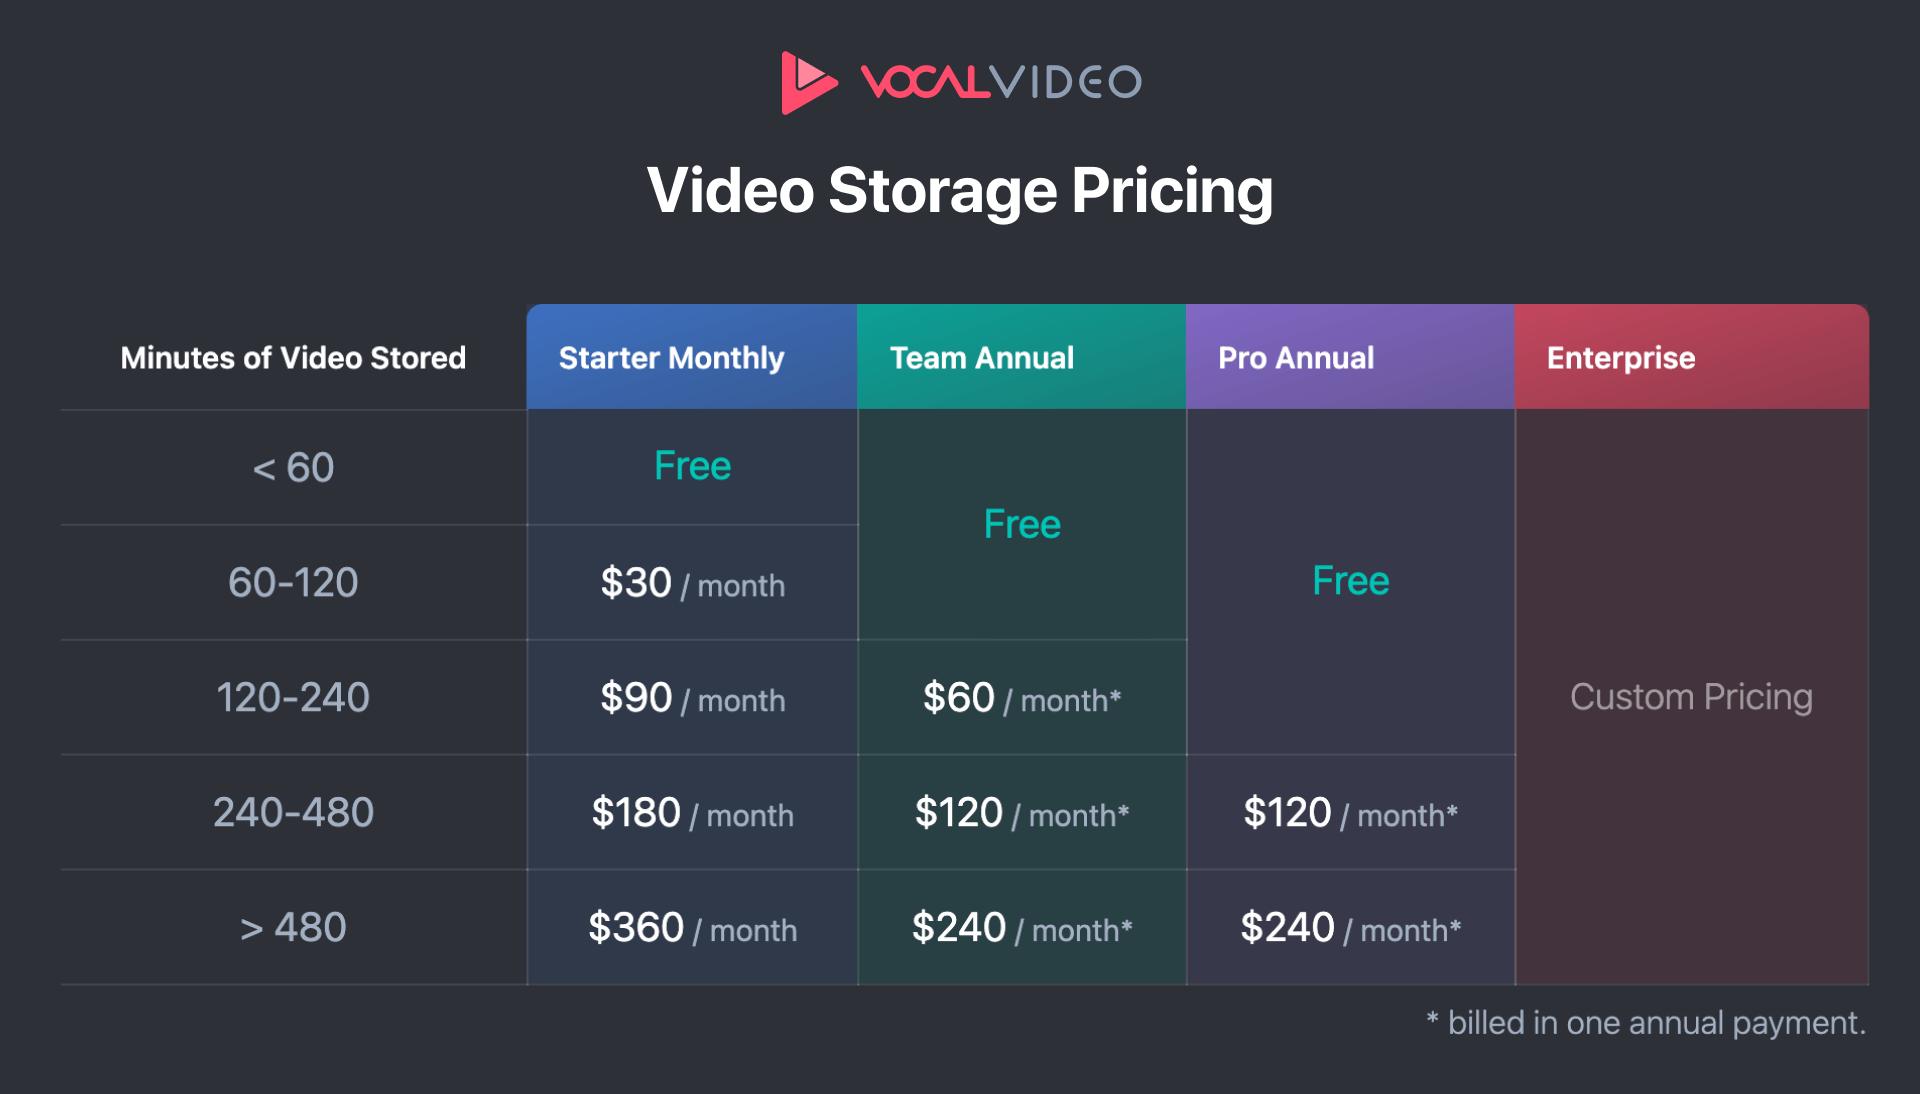 Video storage pricing